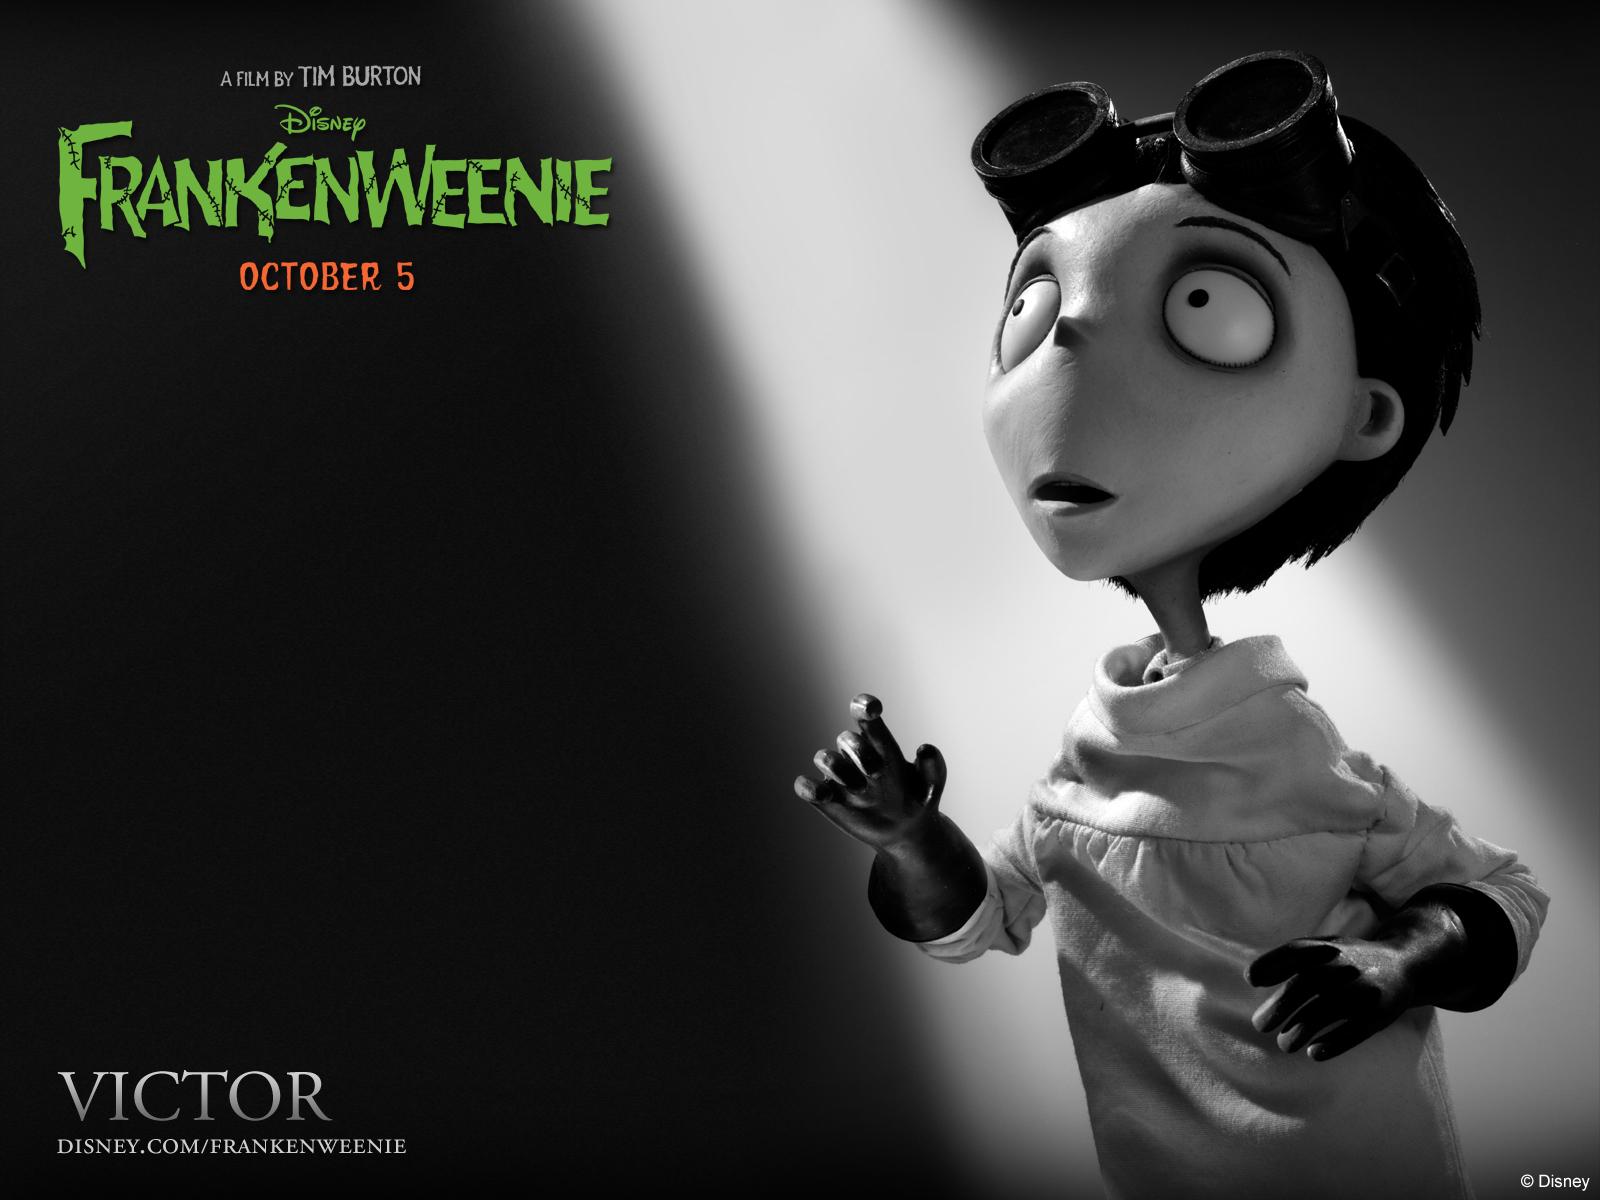 movies tim burton frankenweenie - photo #14